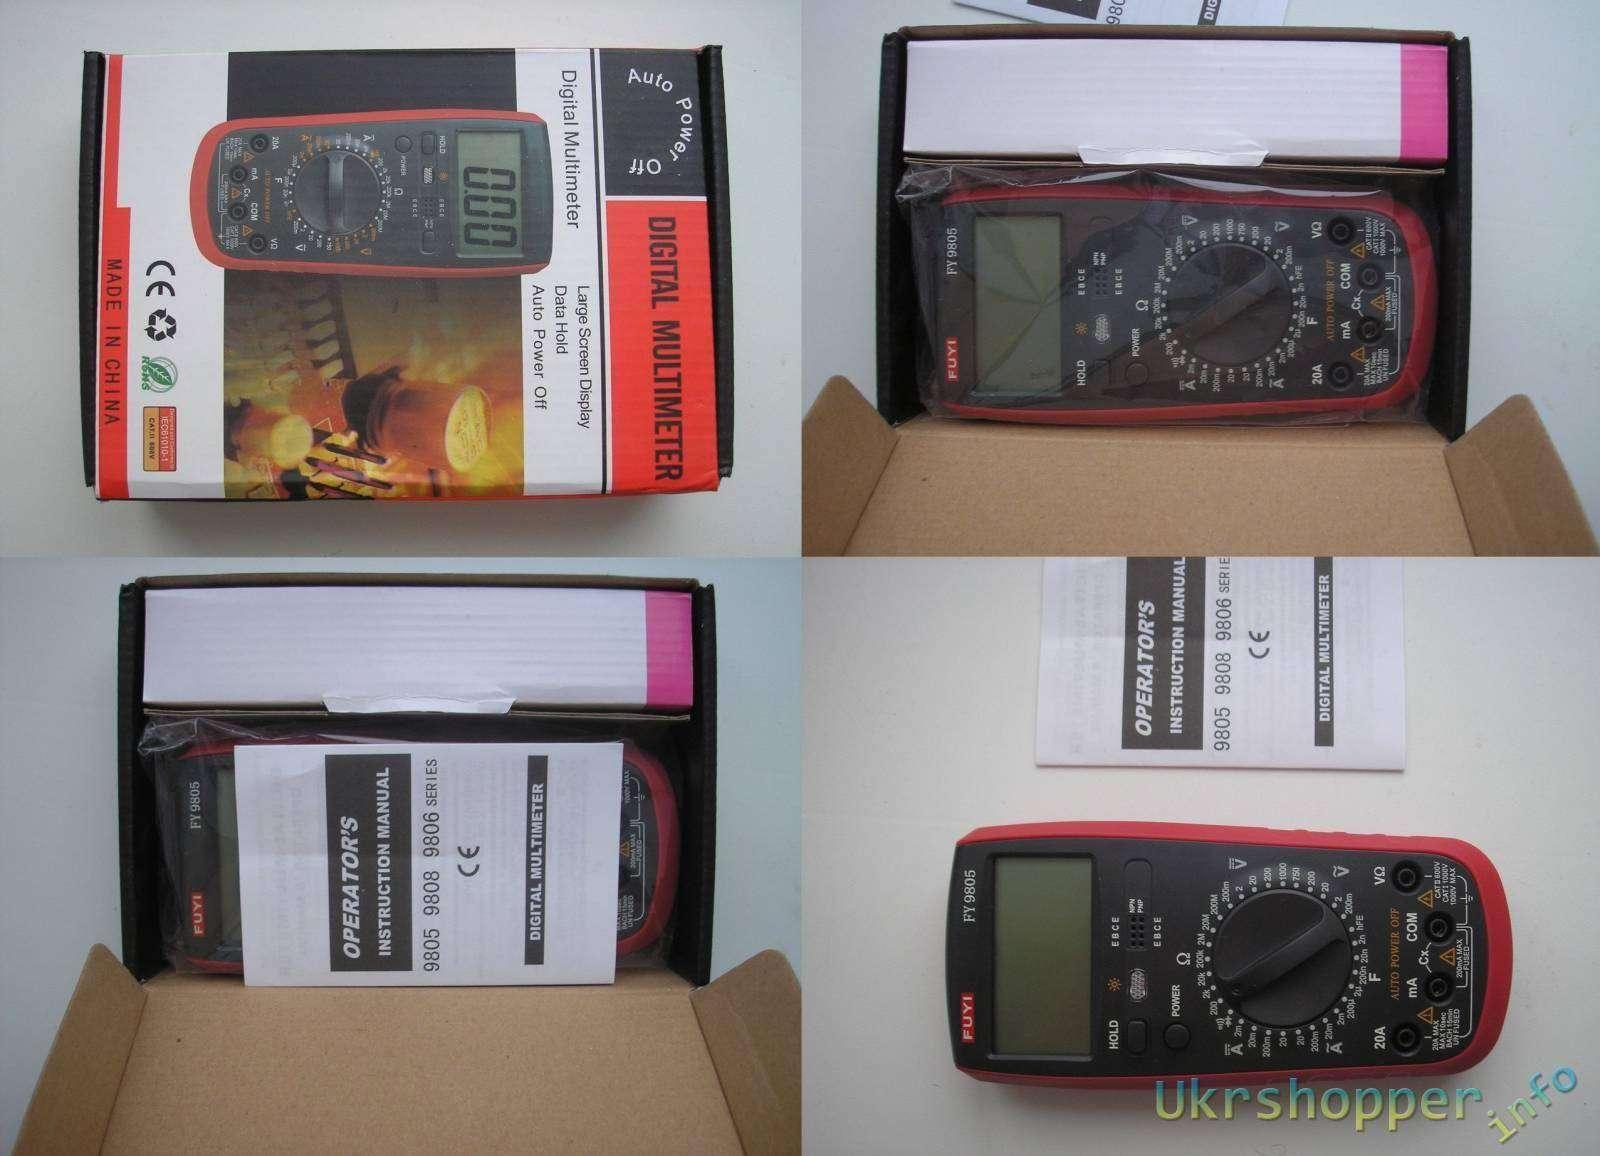 TomTop: FUYI FY9805 Digital Multimeter.